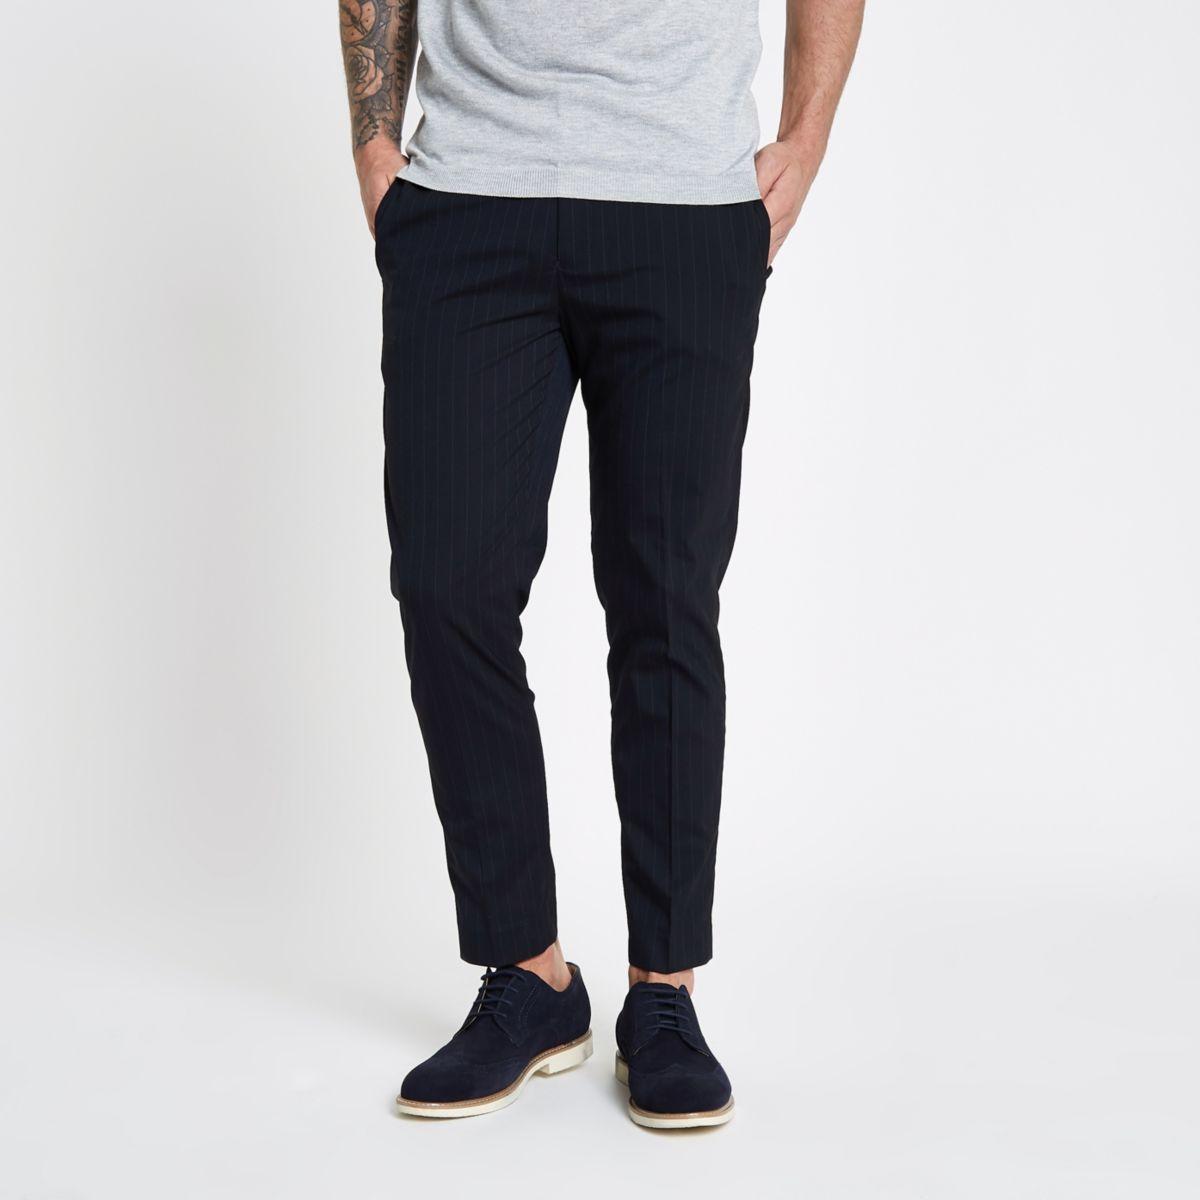 Navy stripe smart jogger pants